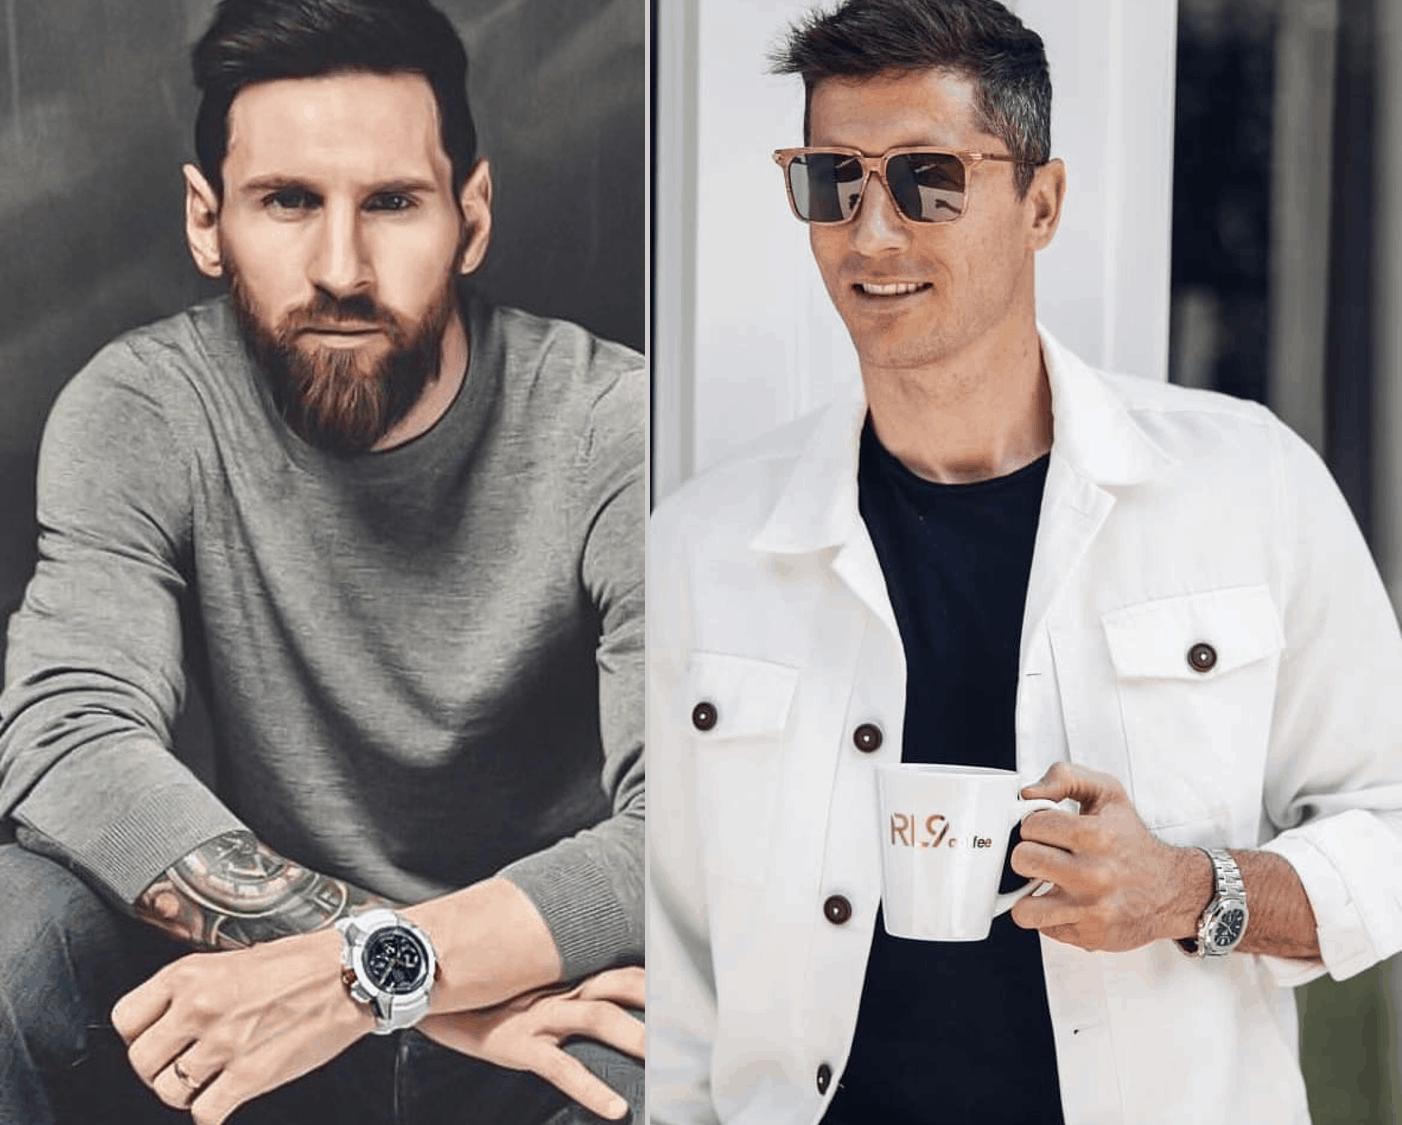 Uhrenvergleich Barcelona Bayern Messi Lewandowski